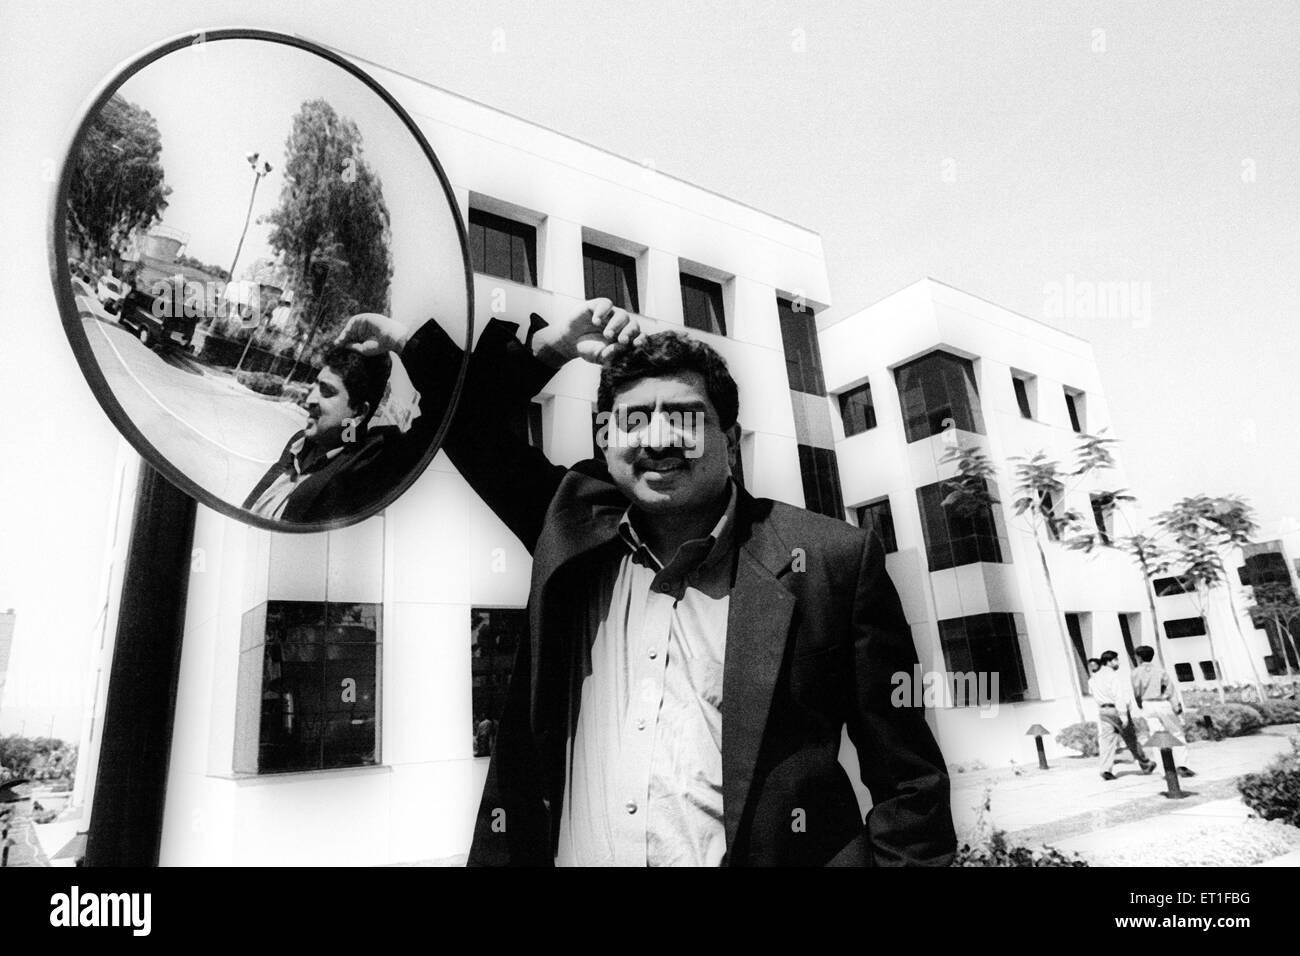 Chief Executive Officer und Director von Infosys Nandan Nilenkani bei Infosys Campus; Bangalore; Karnataka; Indien Stockfoto